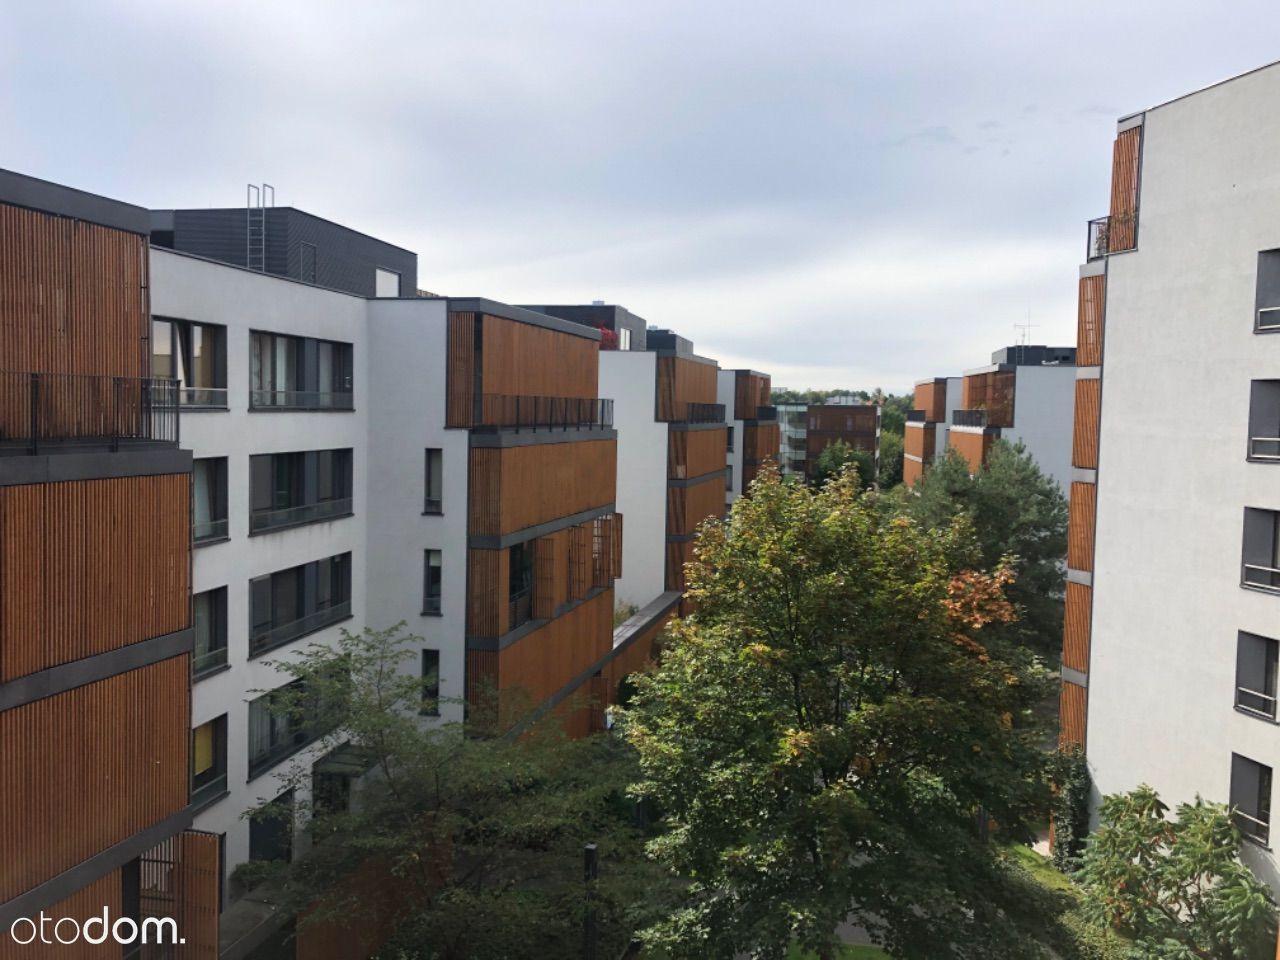 Apartament 4 pokoje, Aleja Wilanowska